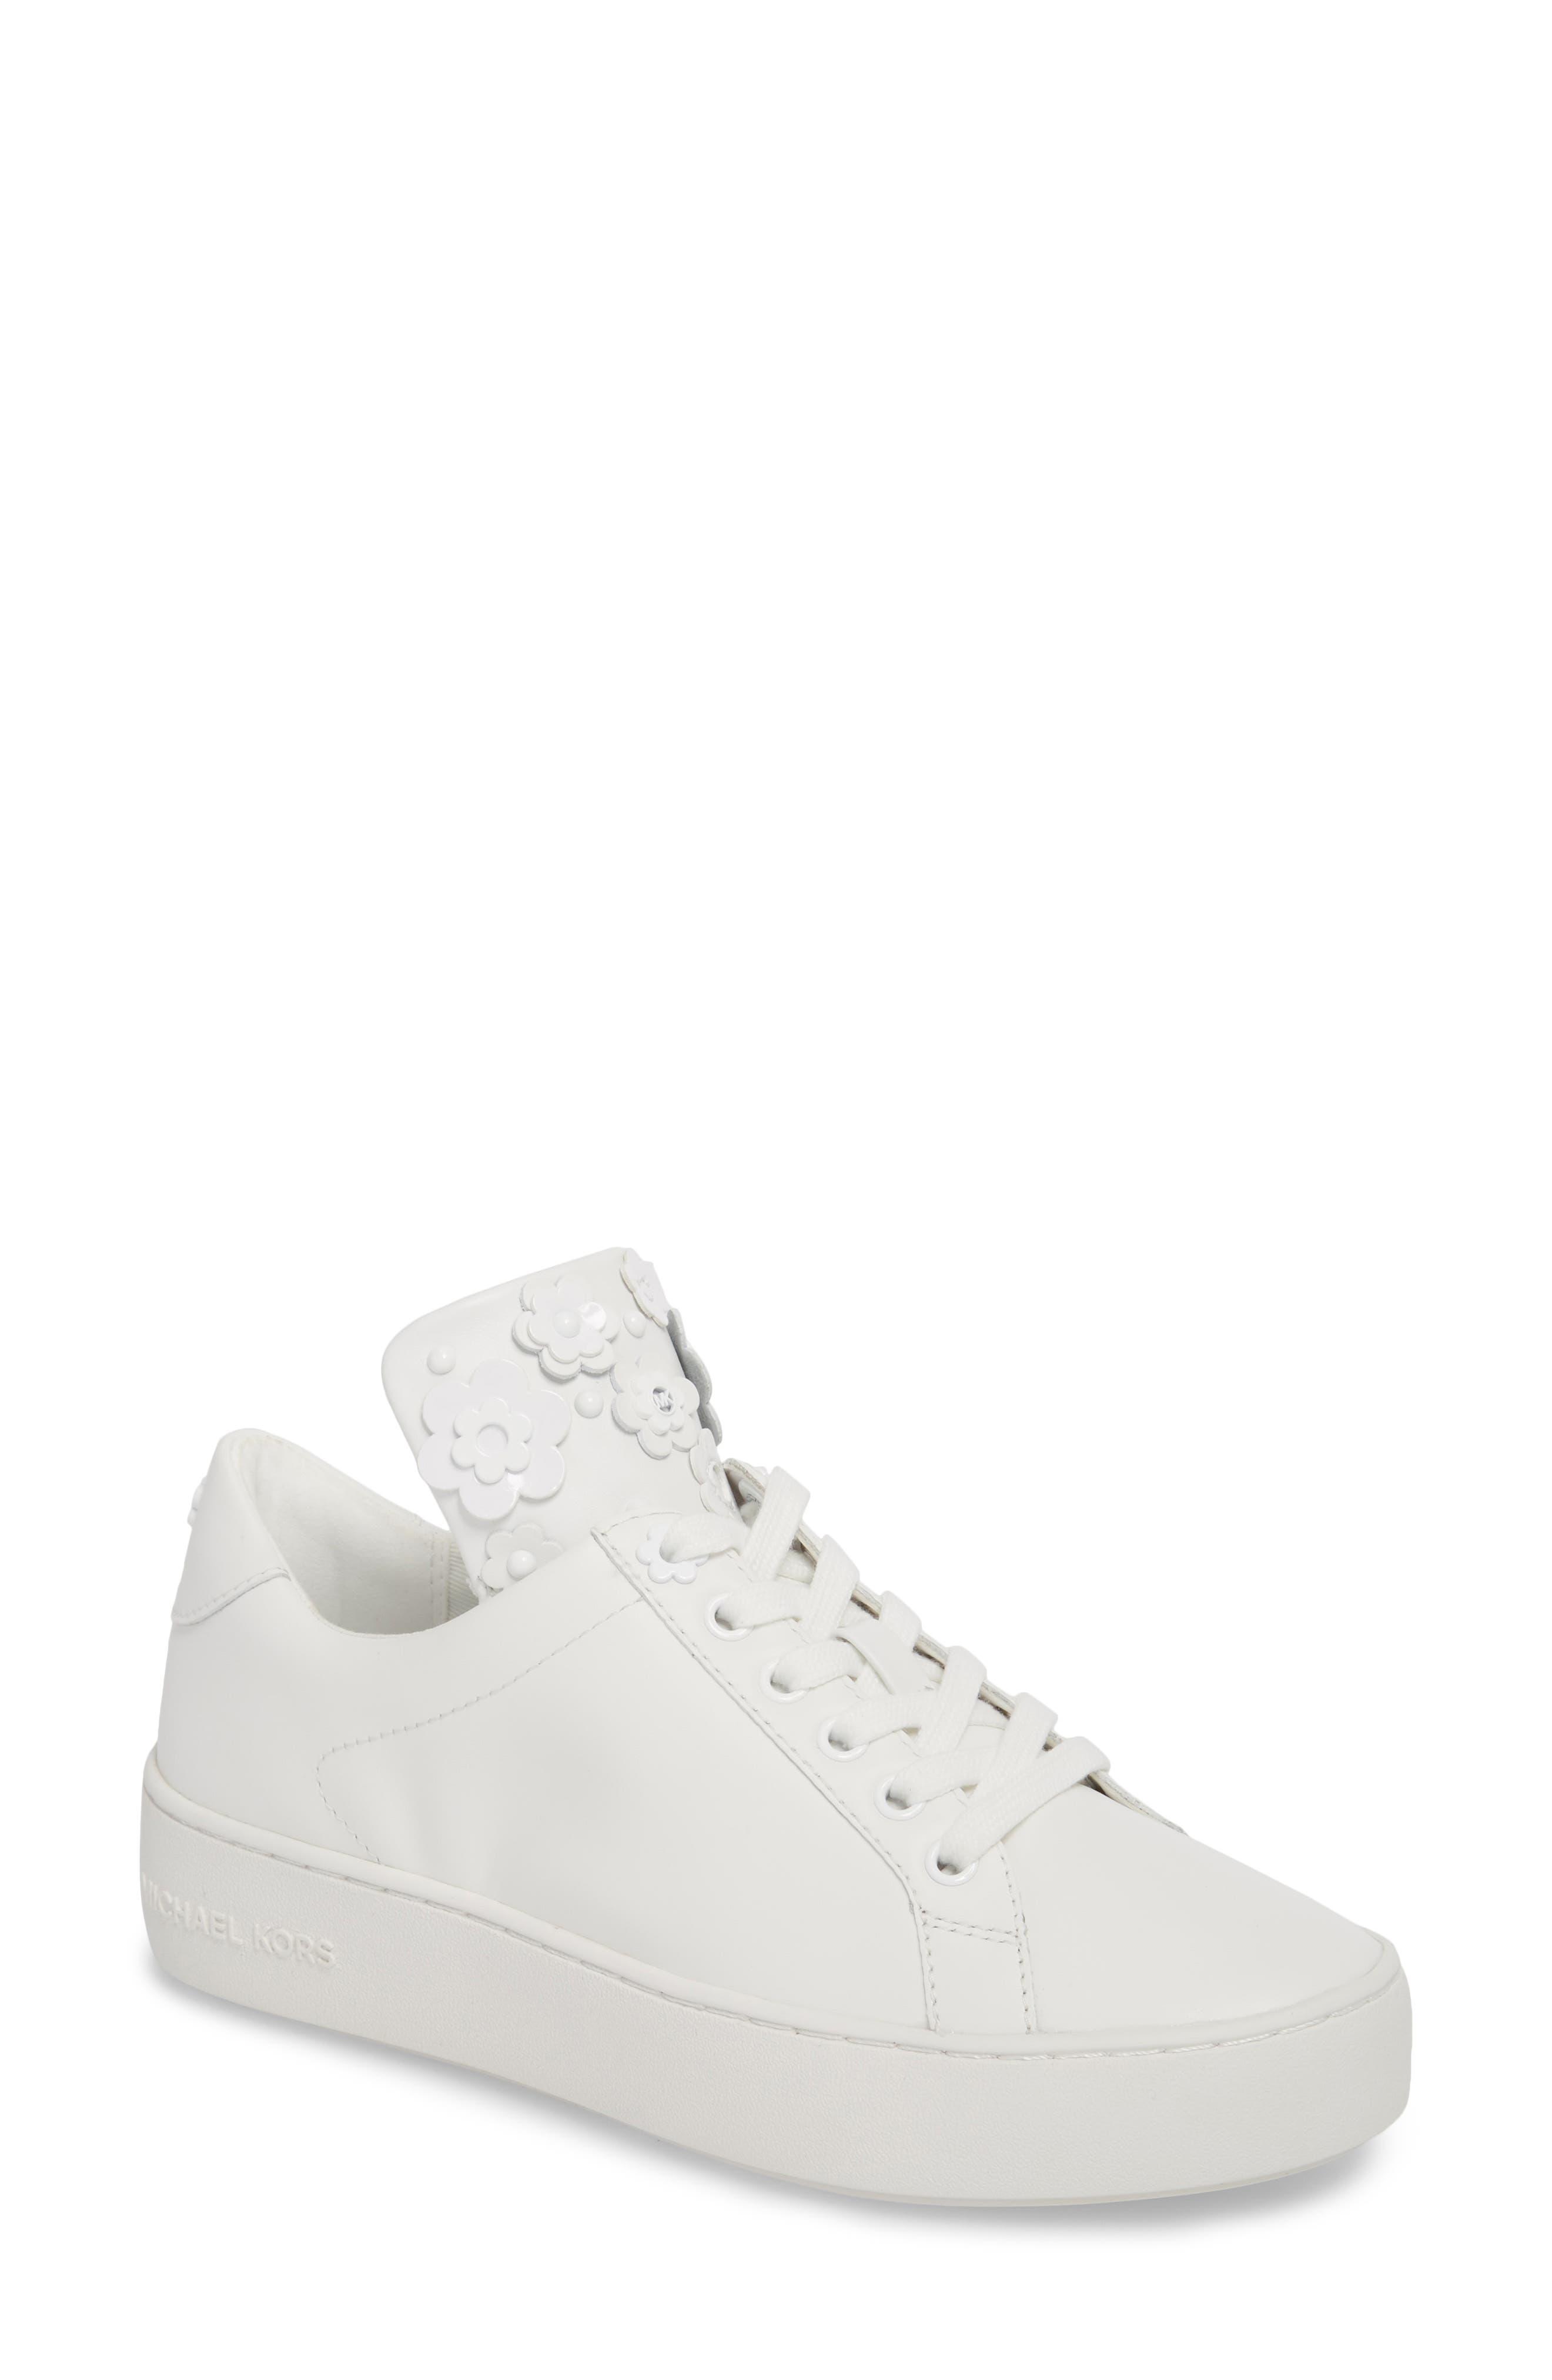 Mindy Platform Sneaker,                             Main thumbnail 1, color,                             Optic White